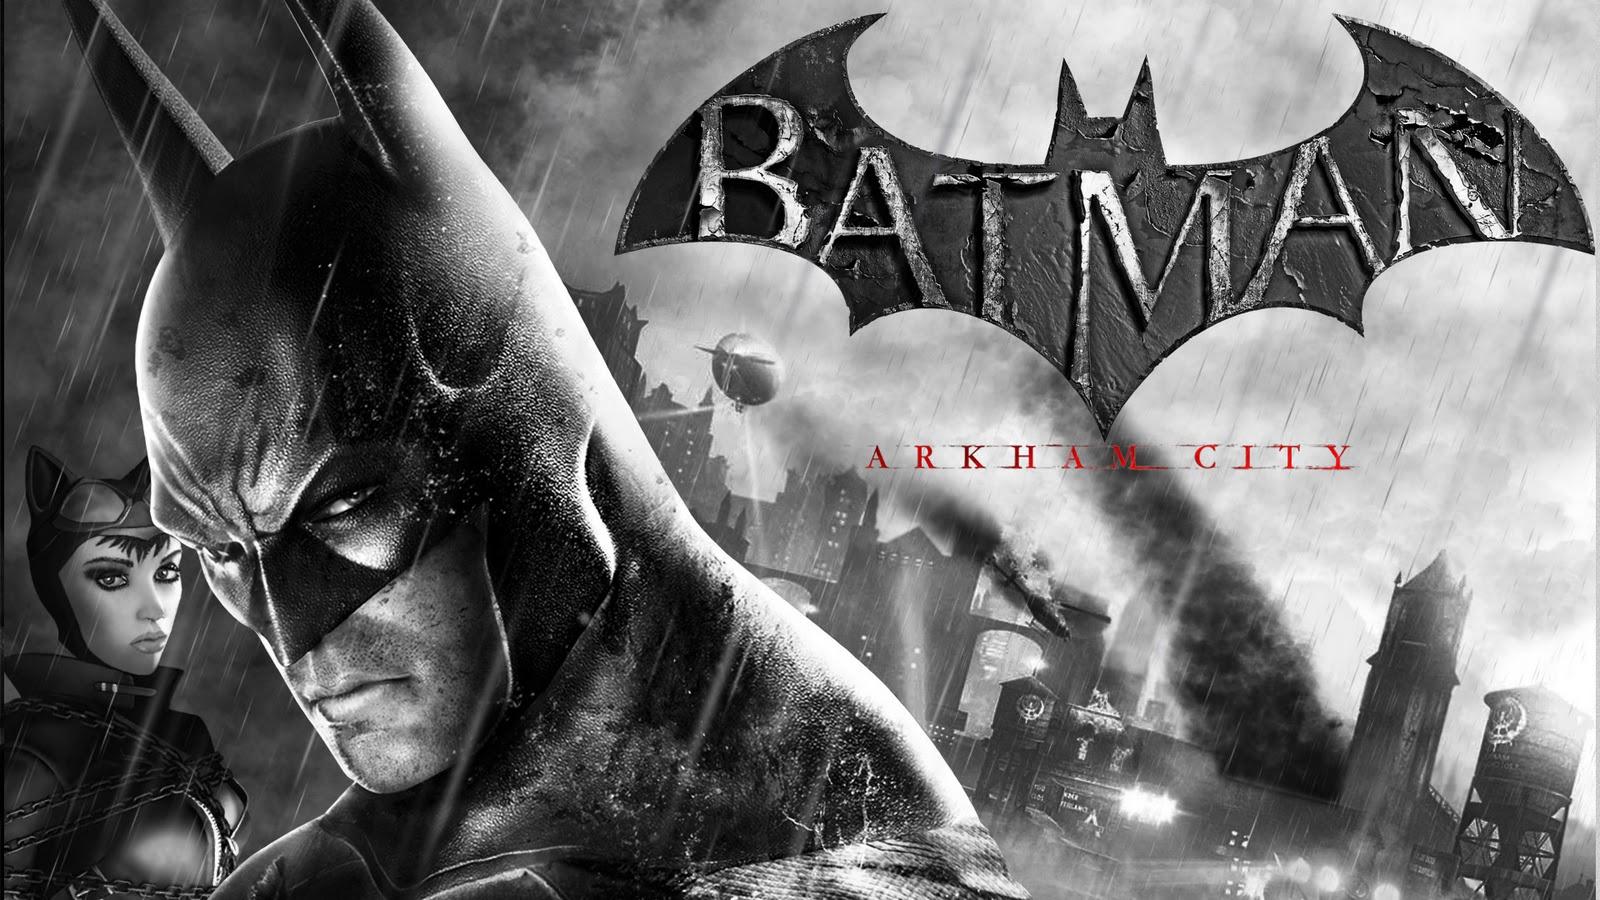 Wallpaper Batman Arkham City Download Wallpaper DaWallpaperz 1600x900